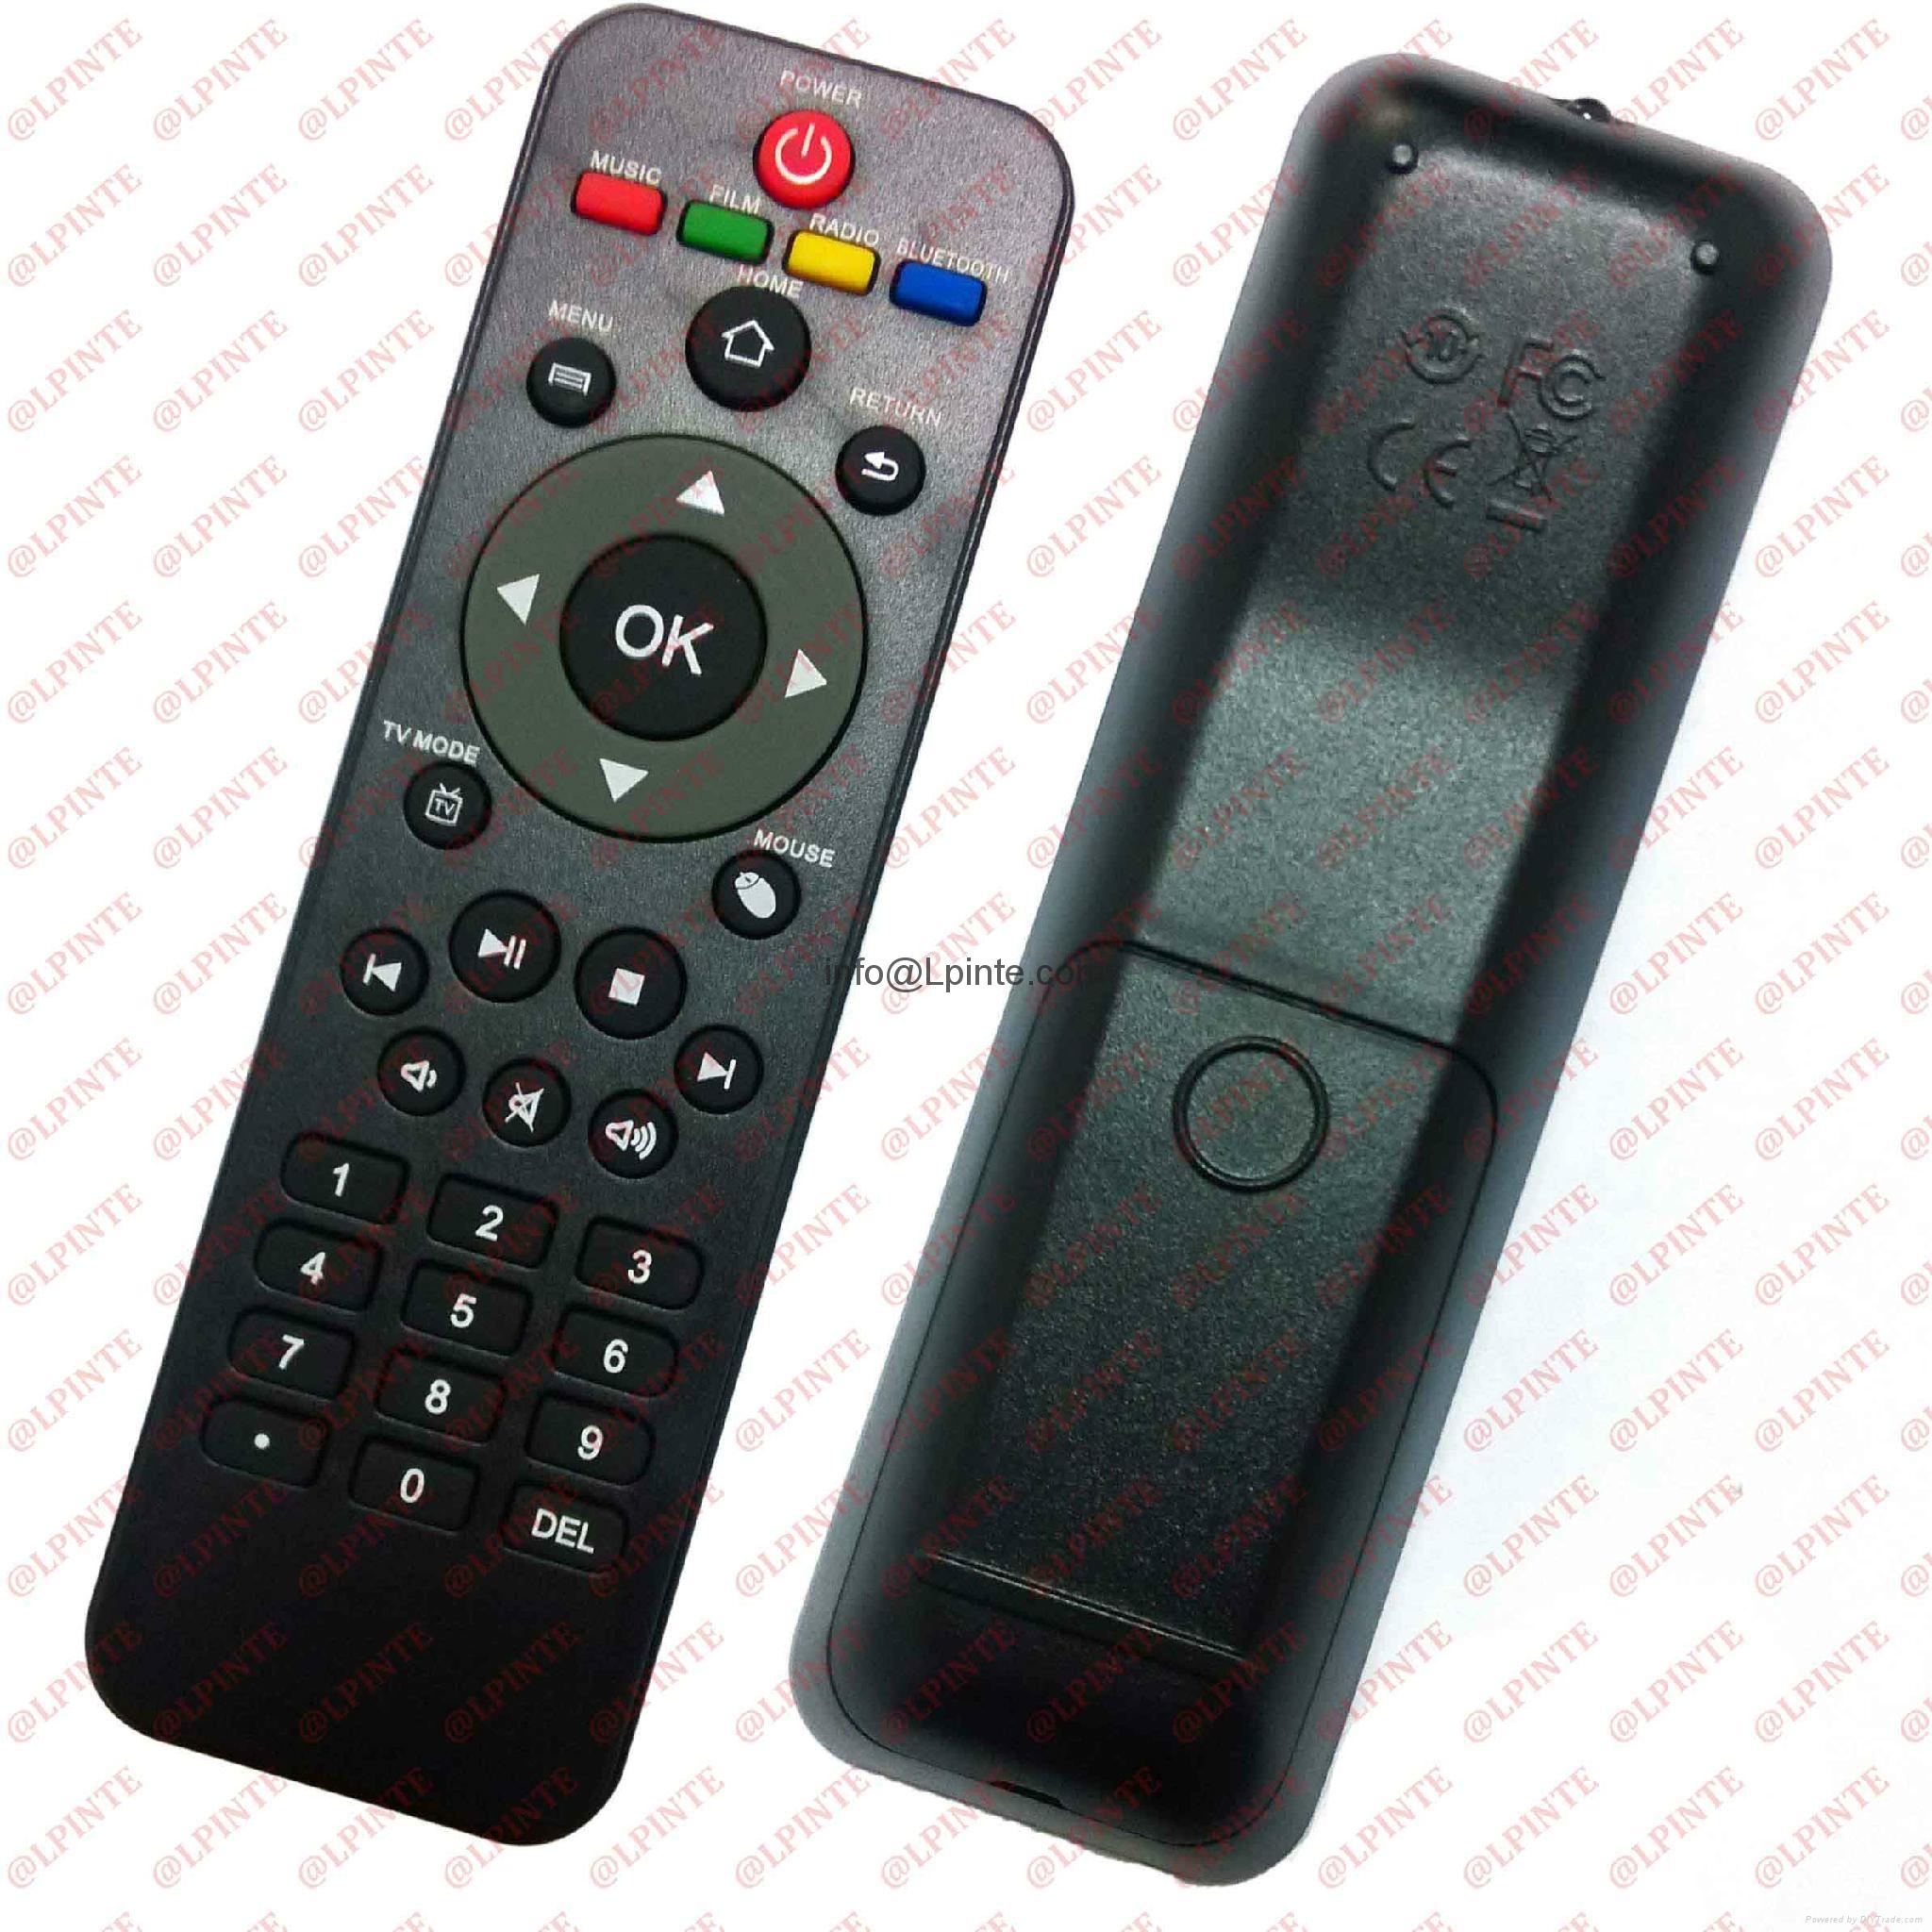 android remote control afstandsbediening Fernbedienung LPI-R34 1